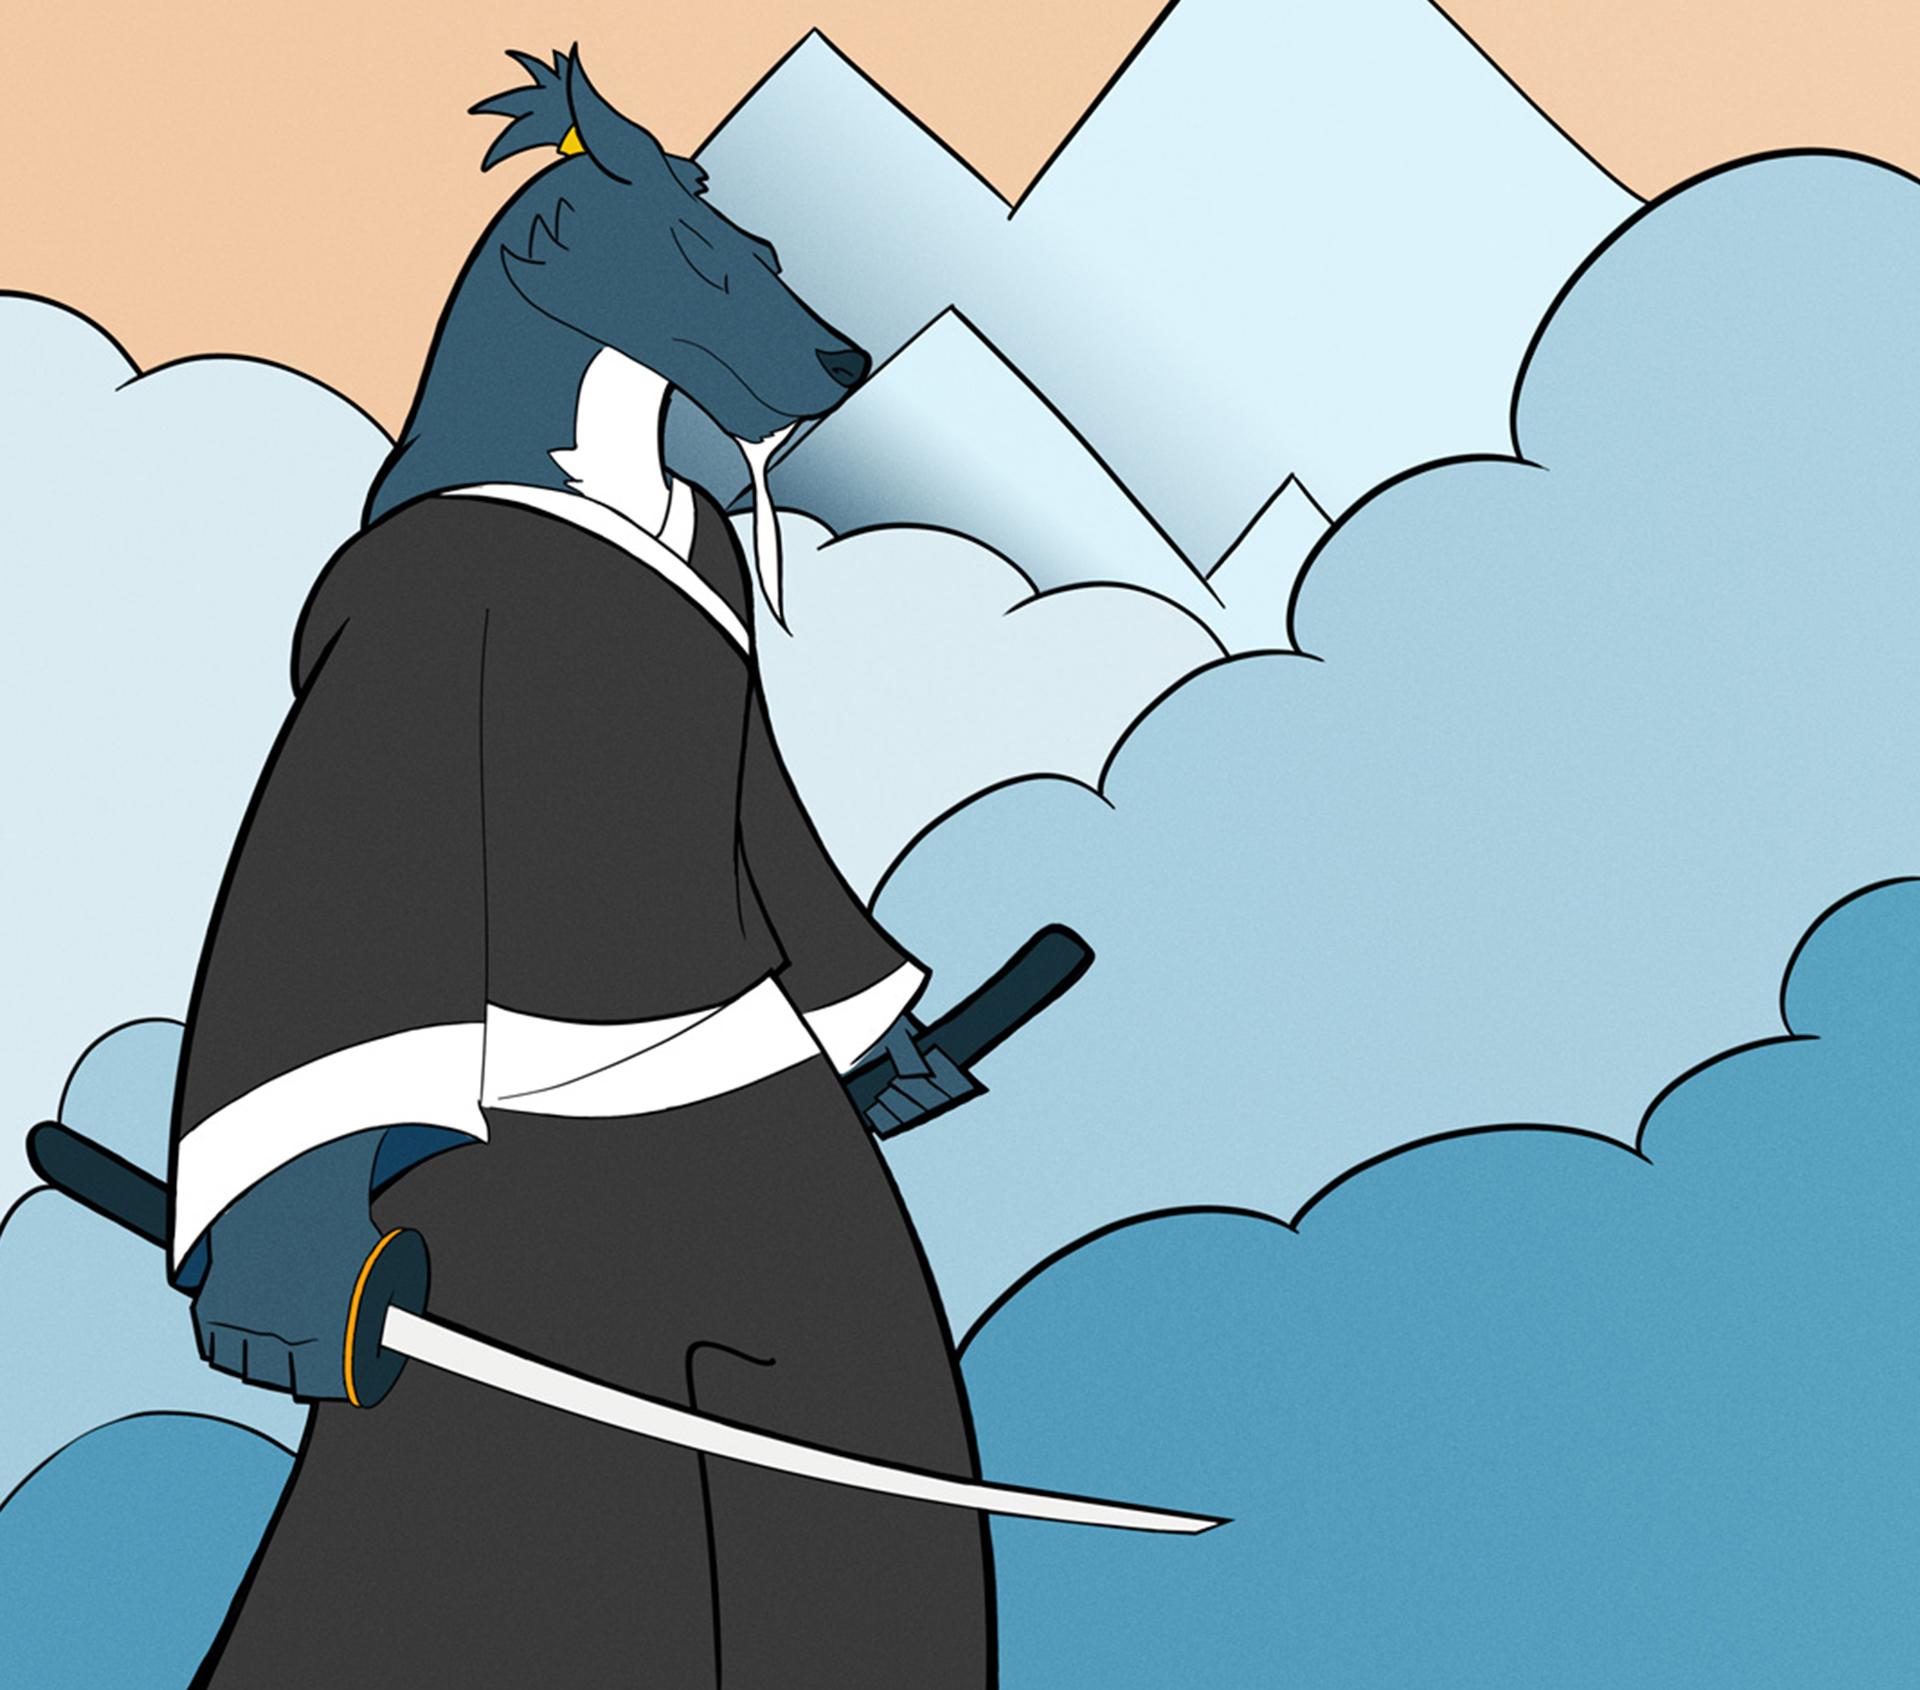 samurai-wolf-illustration-09.jpg